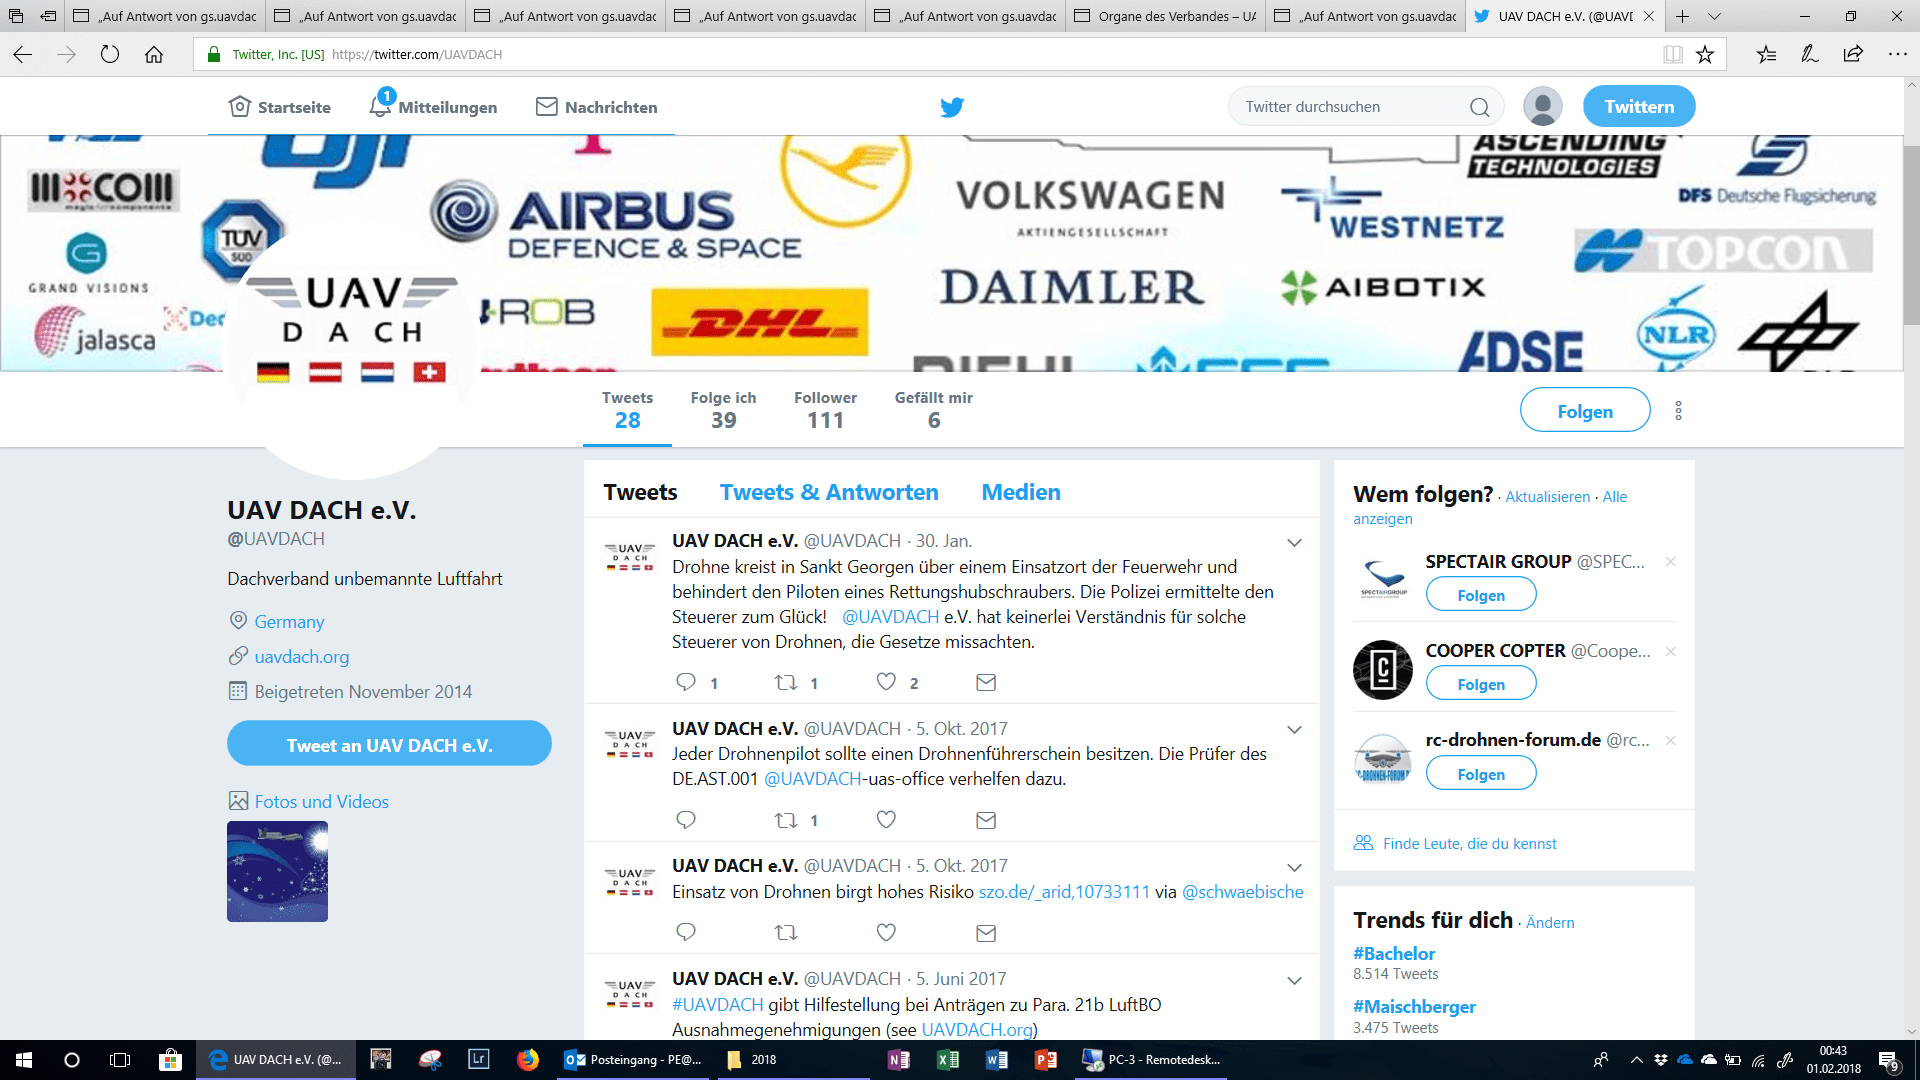 UAV DACH Twitter